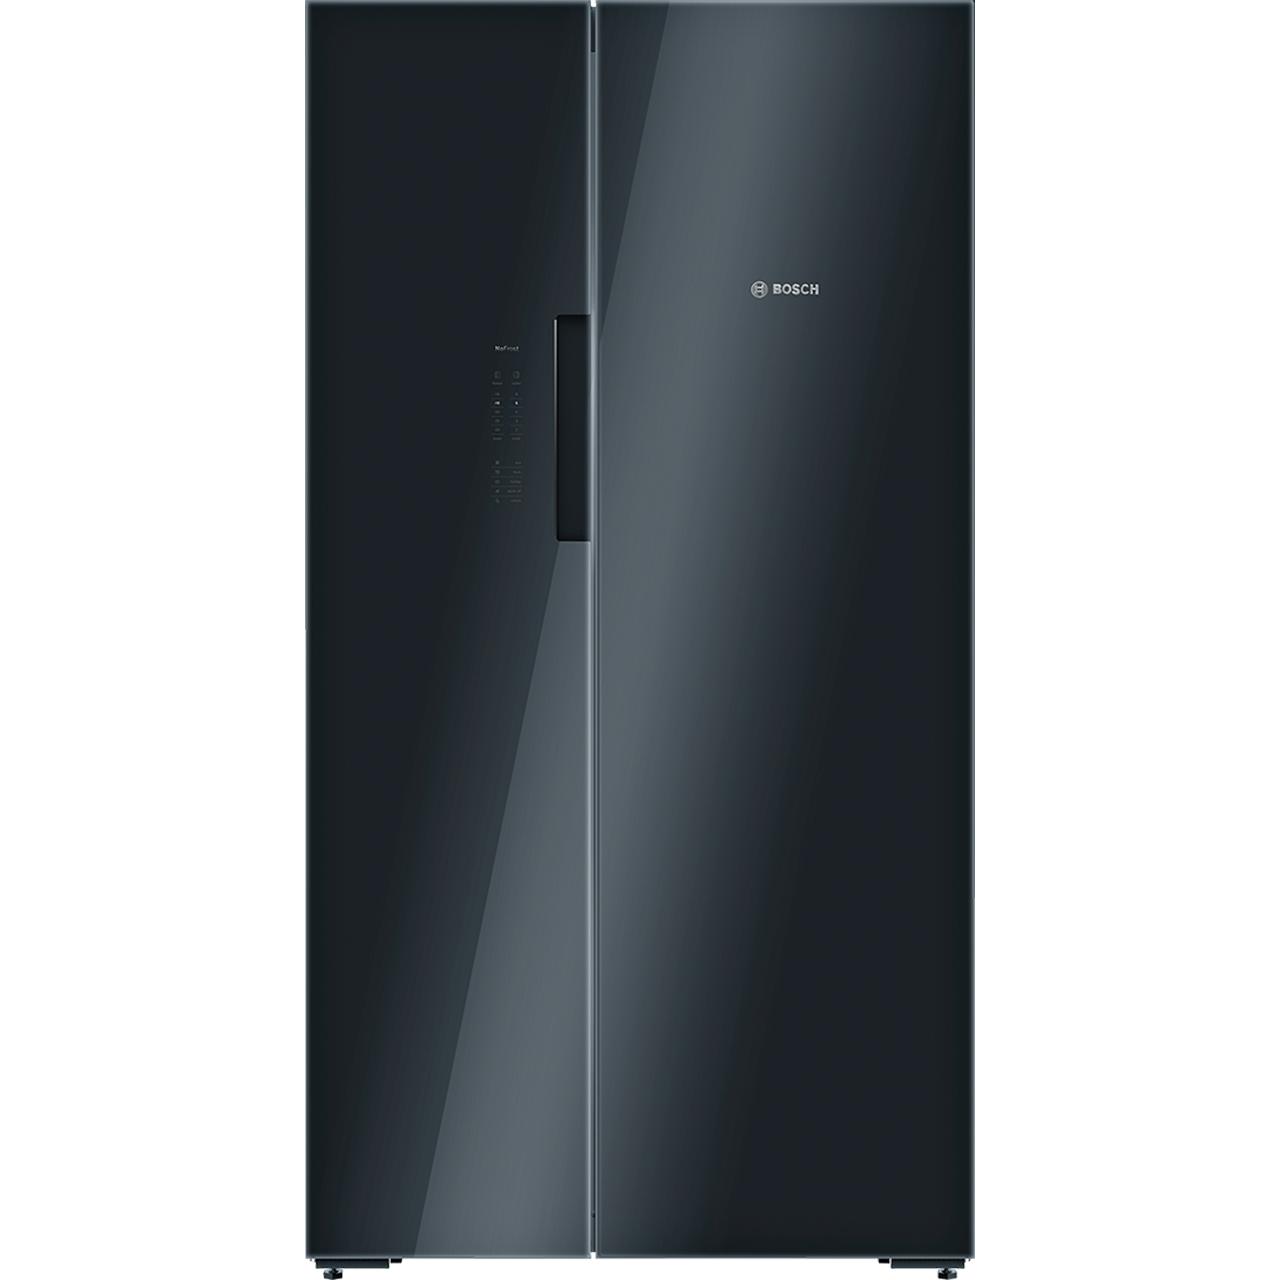 Bosch Serie 8 KAN92LB35 Free Standing American Fridge Freezer in Black Glass